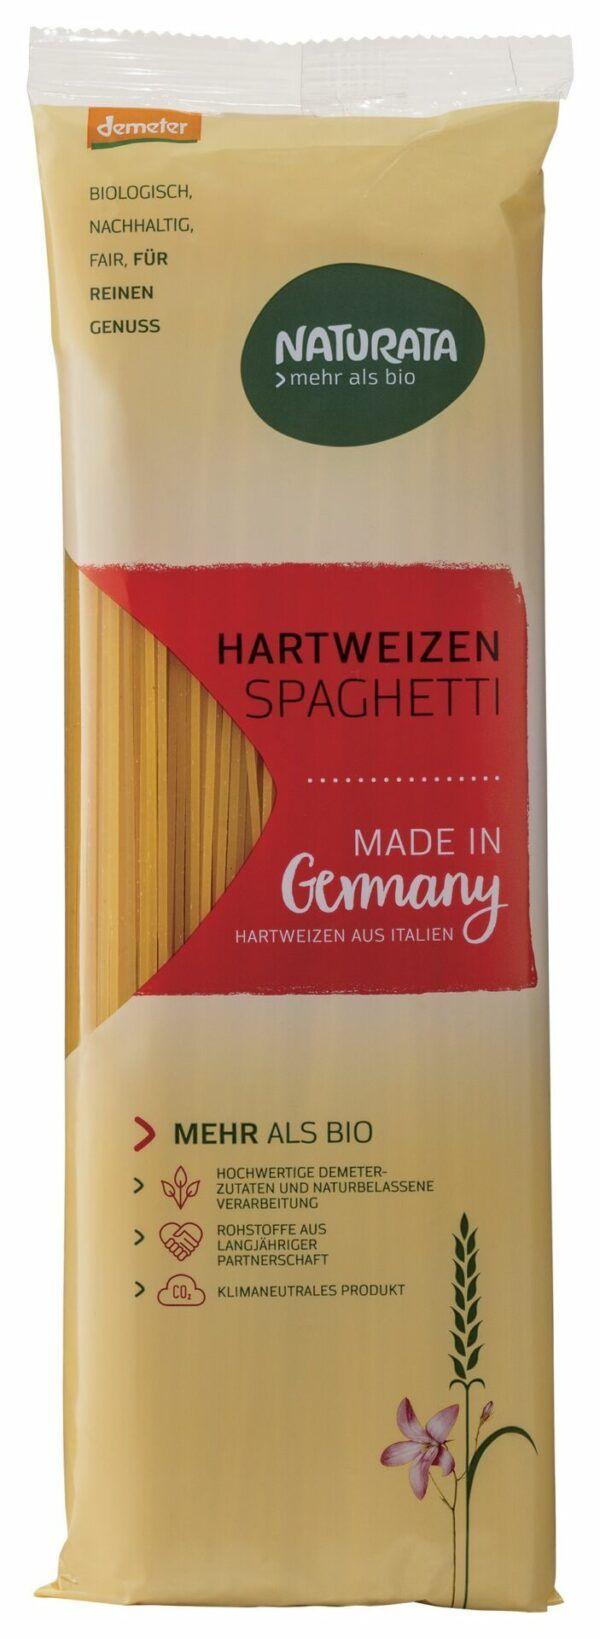 NATURATA Spaghetti, Hartweizen hell 10x500g